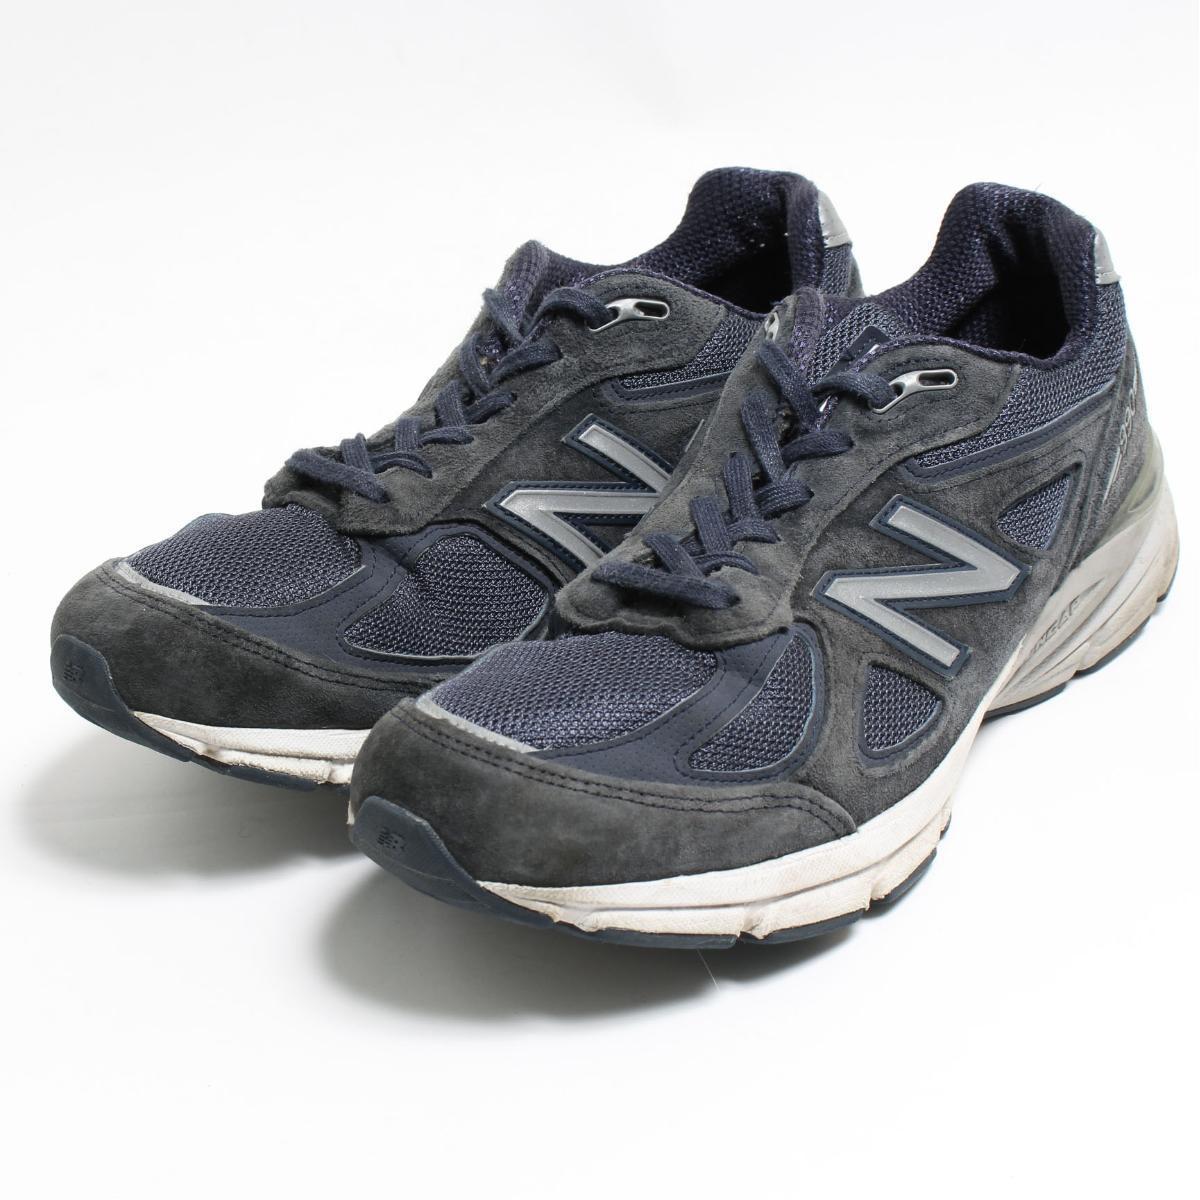 nouveau concept 0dcac 404ca 9.5D men 27.5cm /bon3901 made in New Balance NEW BALANCE M990 NV4 sneakers  USA